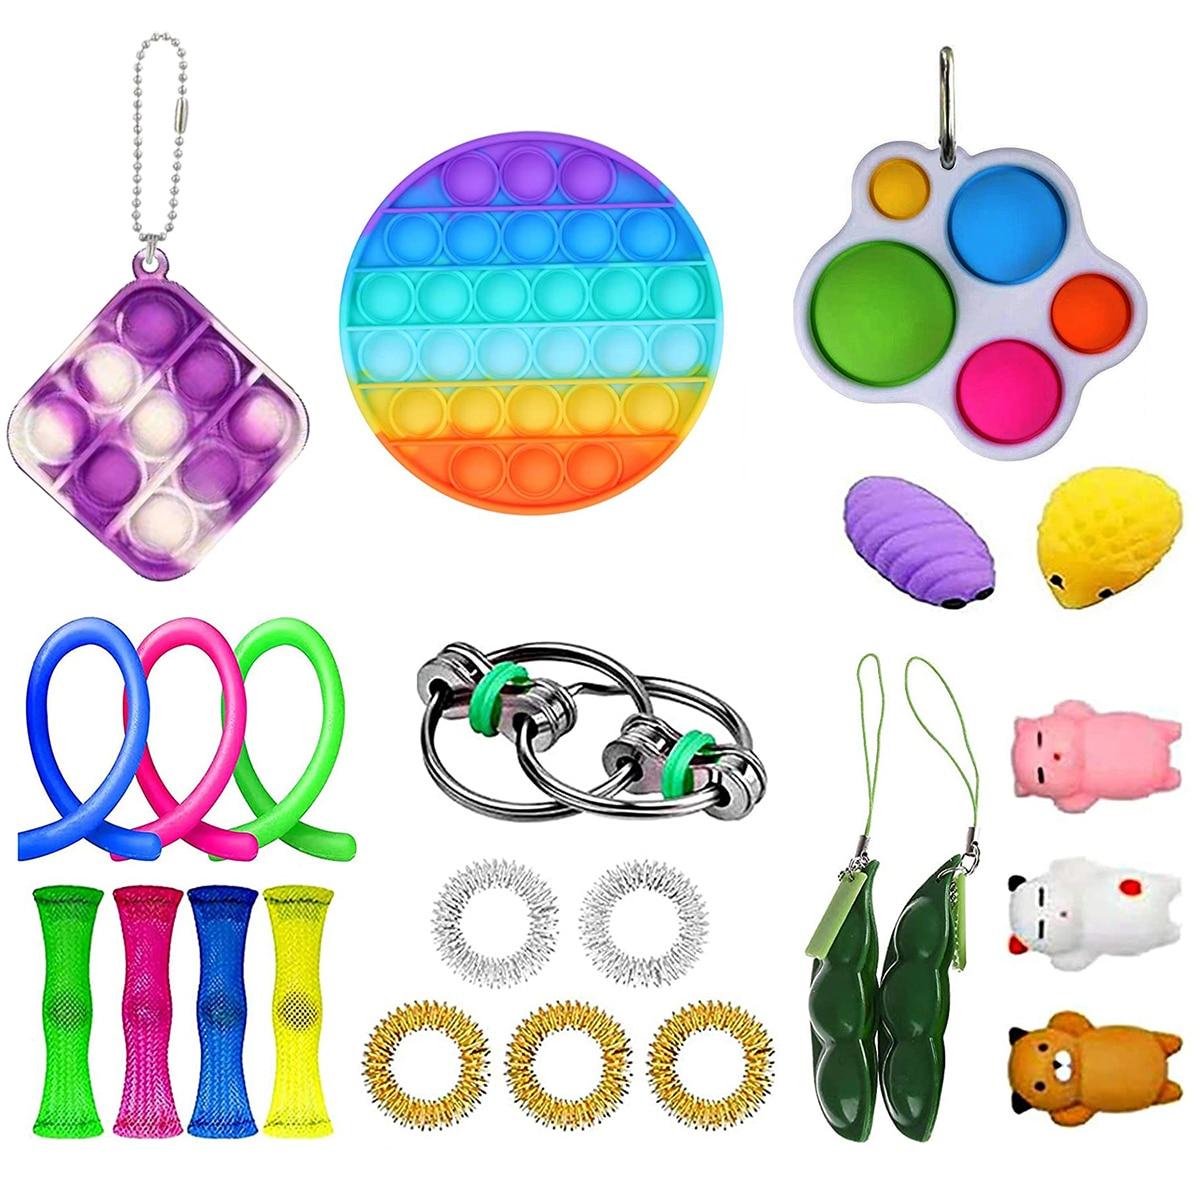 23PCS Pack Fidget Sensory Toy Set Stress Relief Toys Autism Anxiety Relief Stress Push Bubble Fidget Toys For Kids Adults enlarge